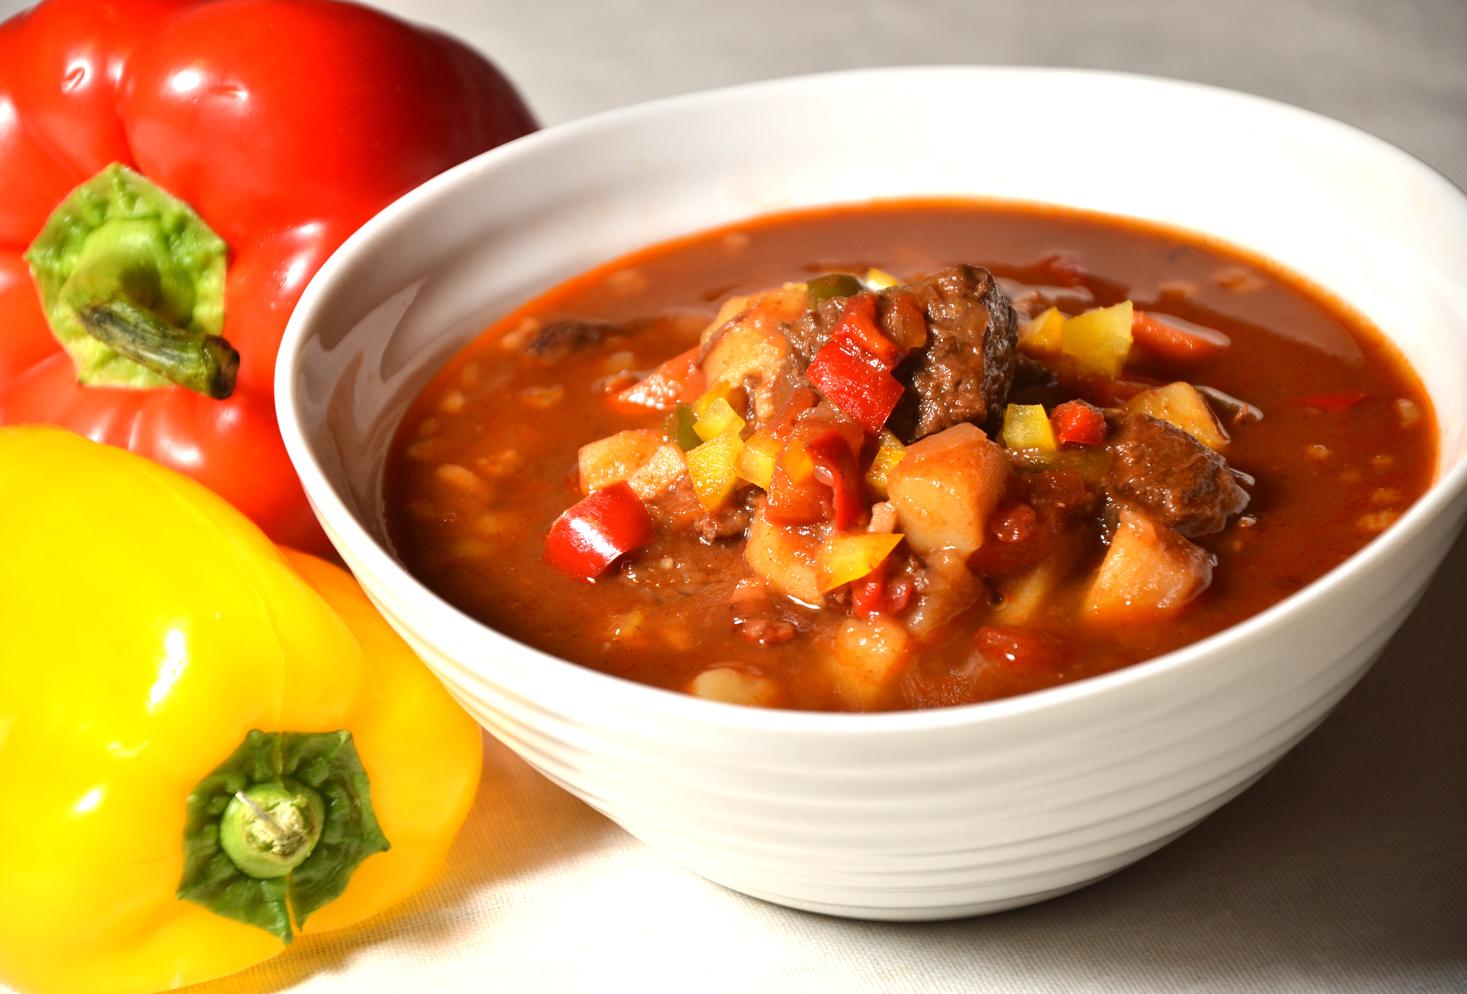 Gulasj suppe zupa gulashowa ungarsk paprika 1000